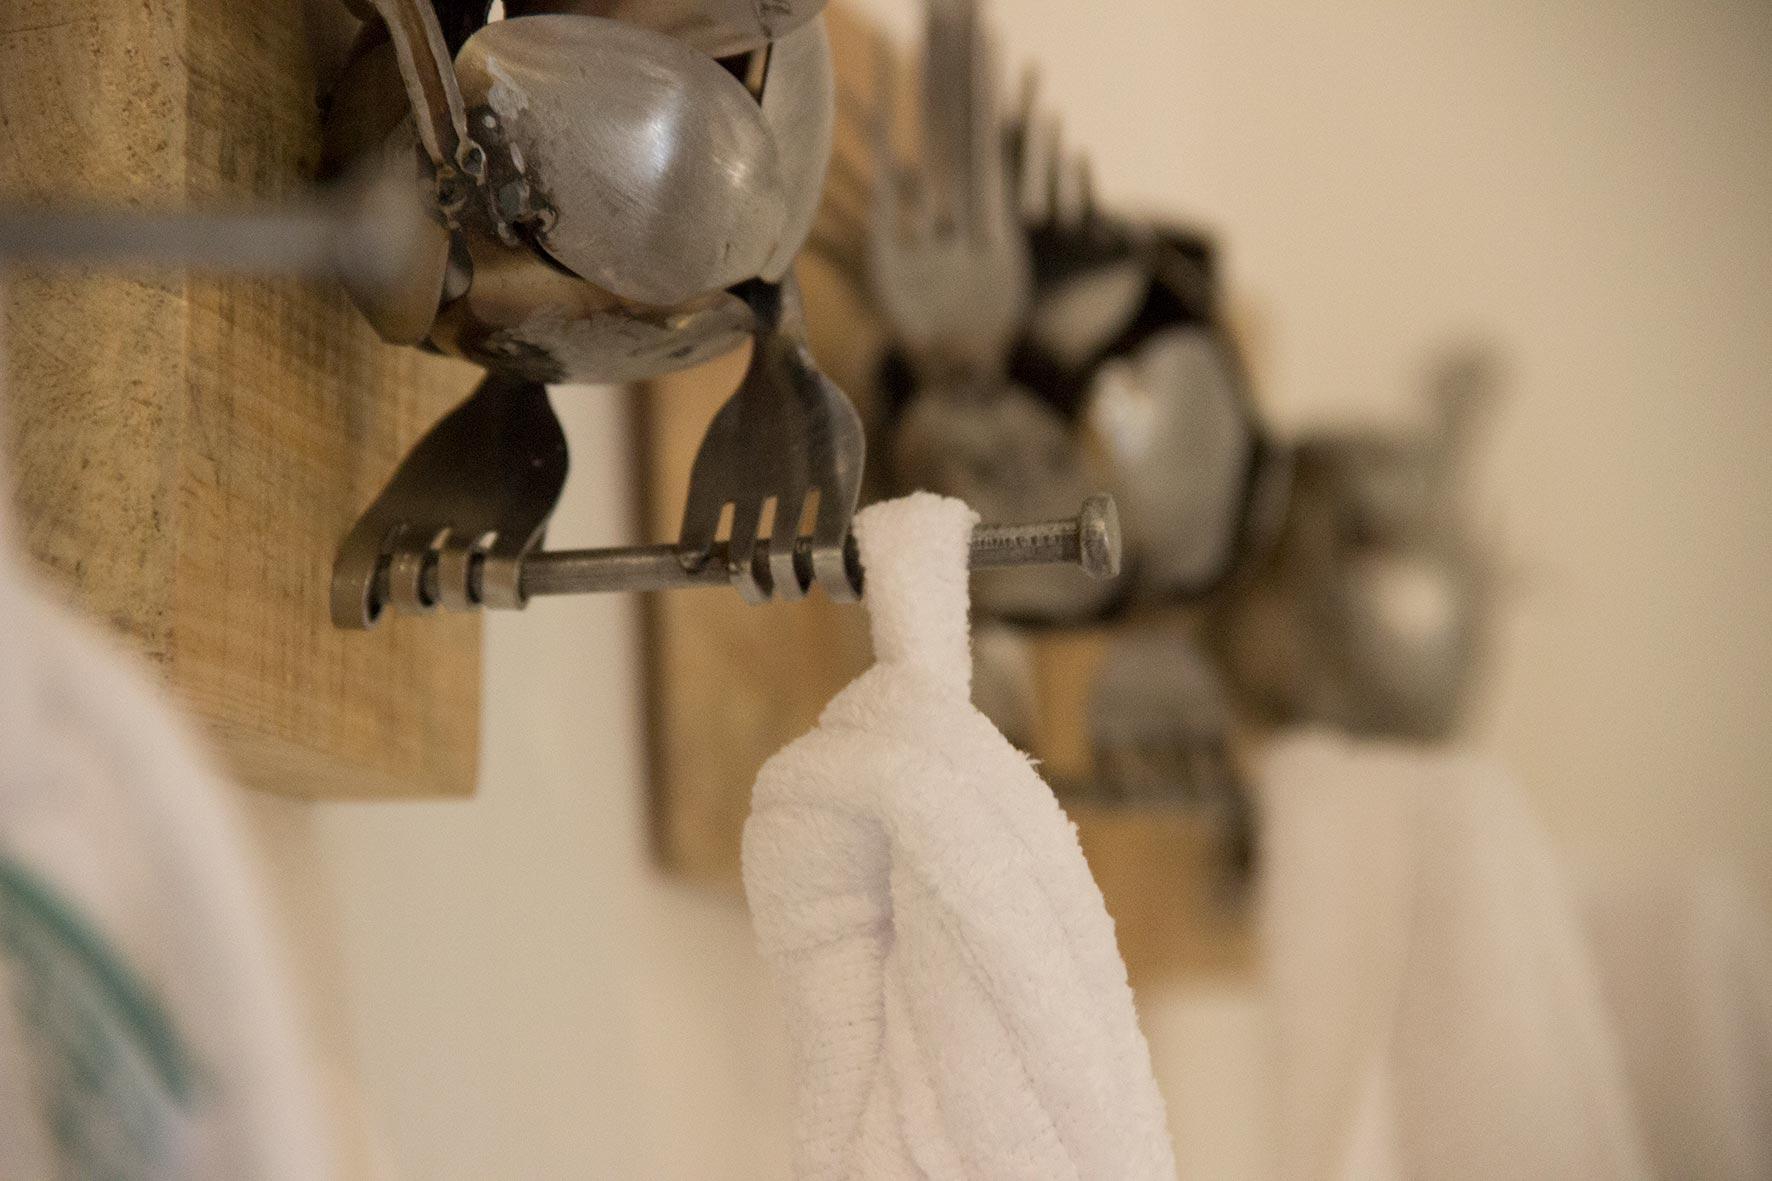 Batas para baño